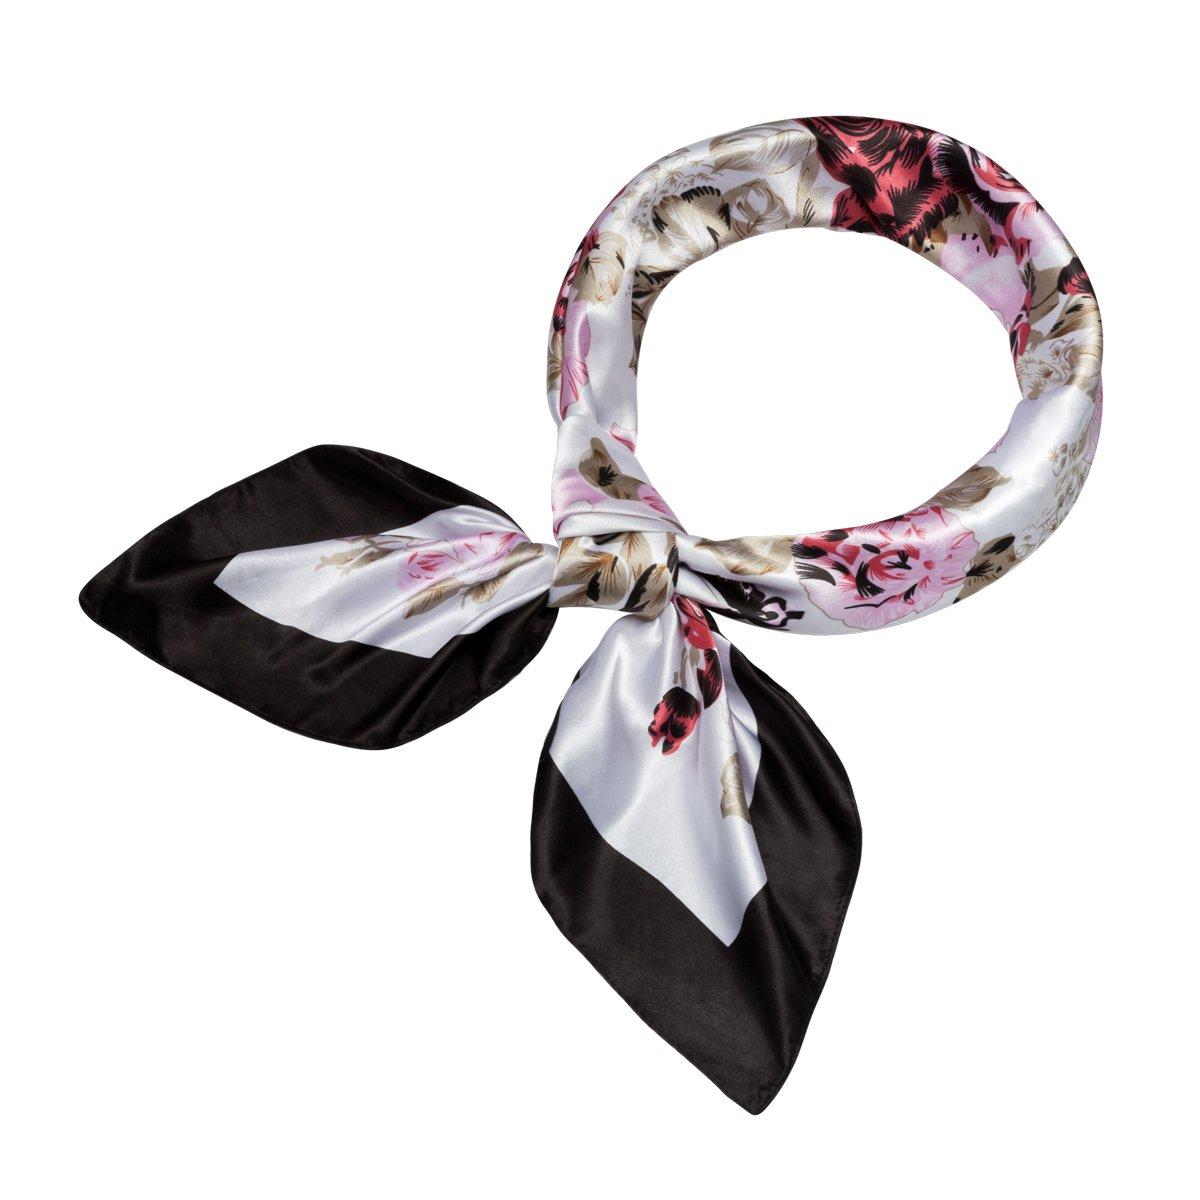 Flowomen Women\'s Silk Scarf colorful Square Large Neckerchief Daily Luxury Fashion Wrap (Black1)